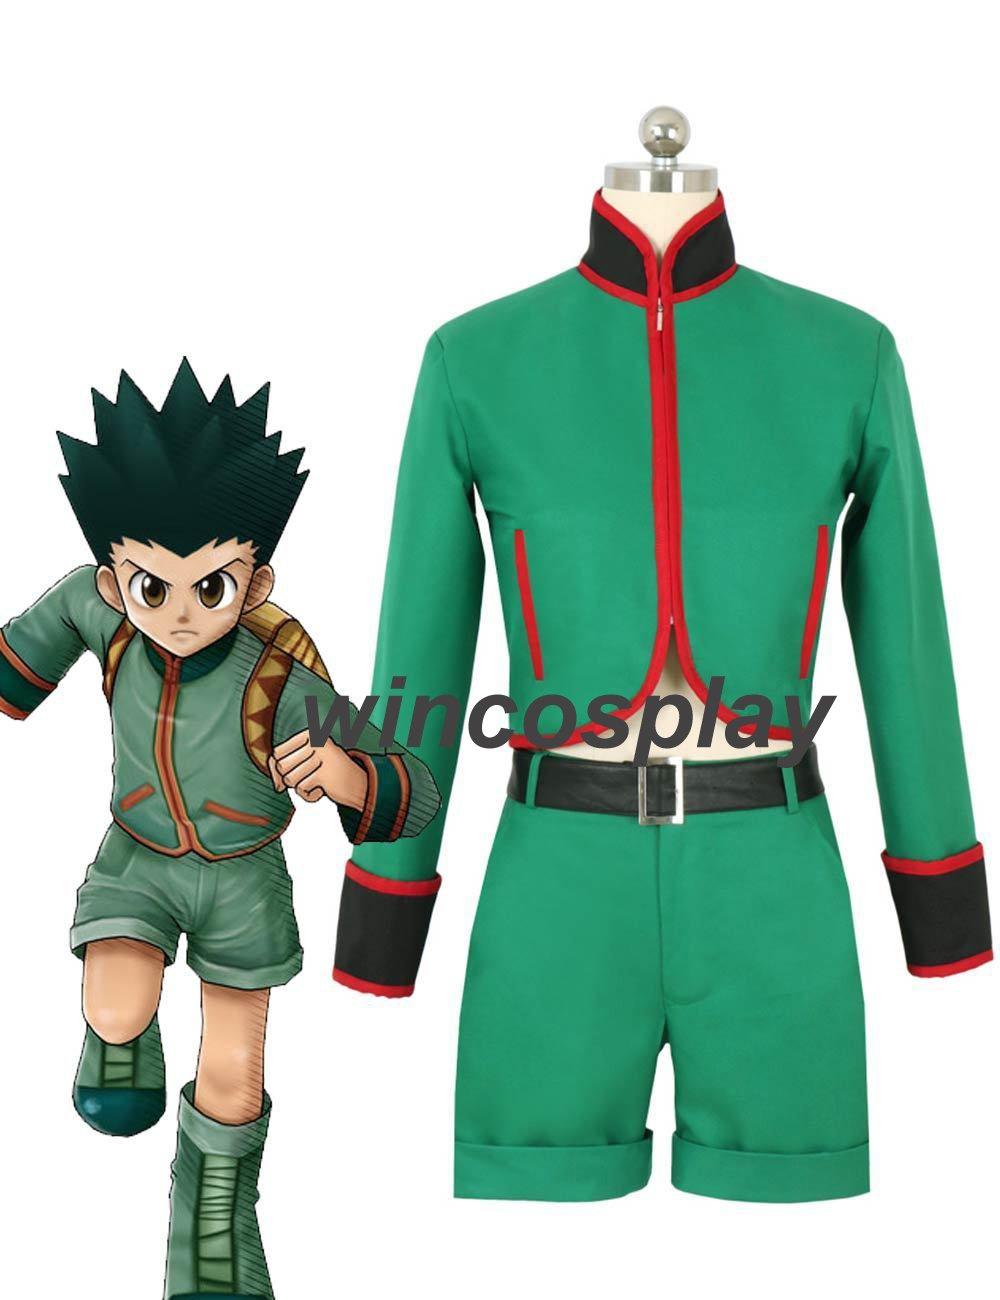 Cosplay Costume Hunter X Hunter Gon Freecss Uniform Cosplay Costume